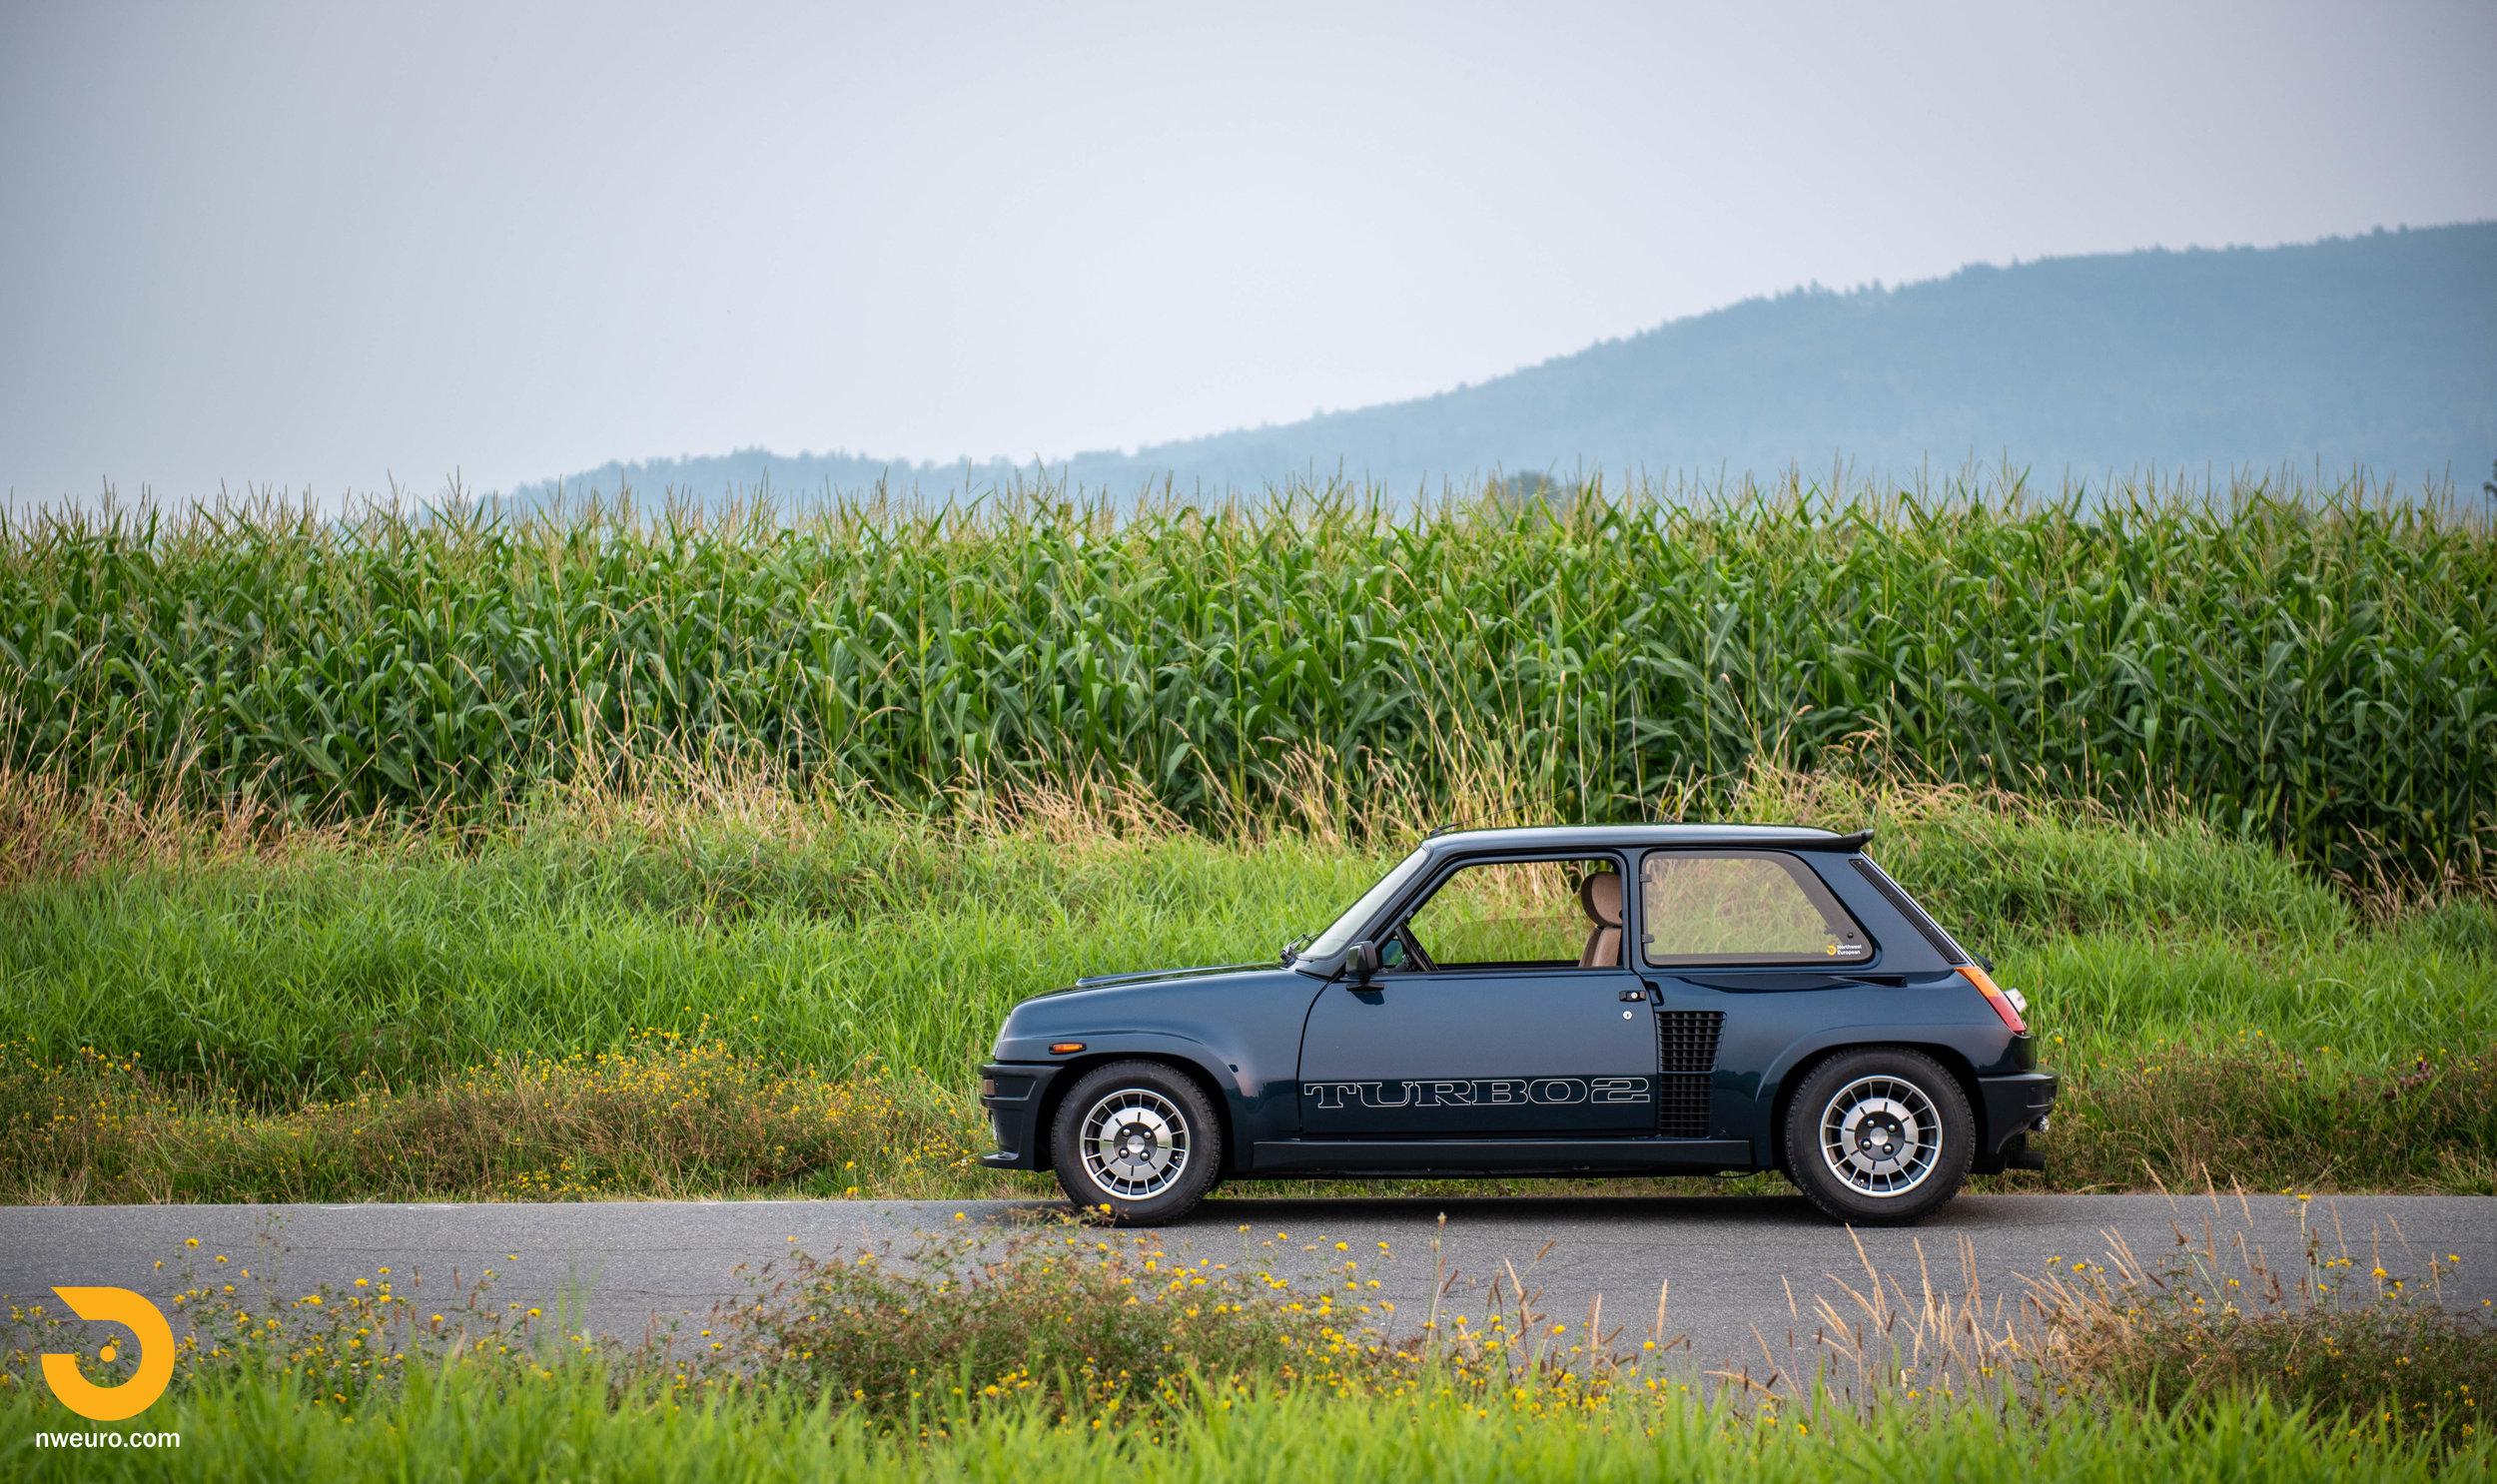 Renault on Corn-1.jpg